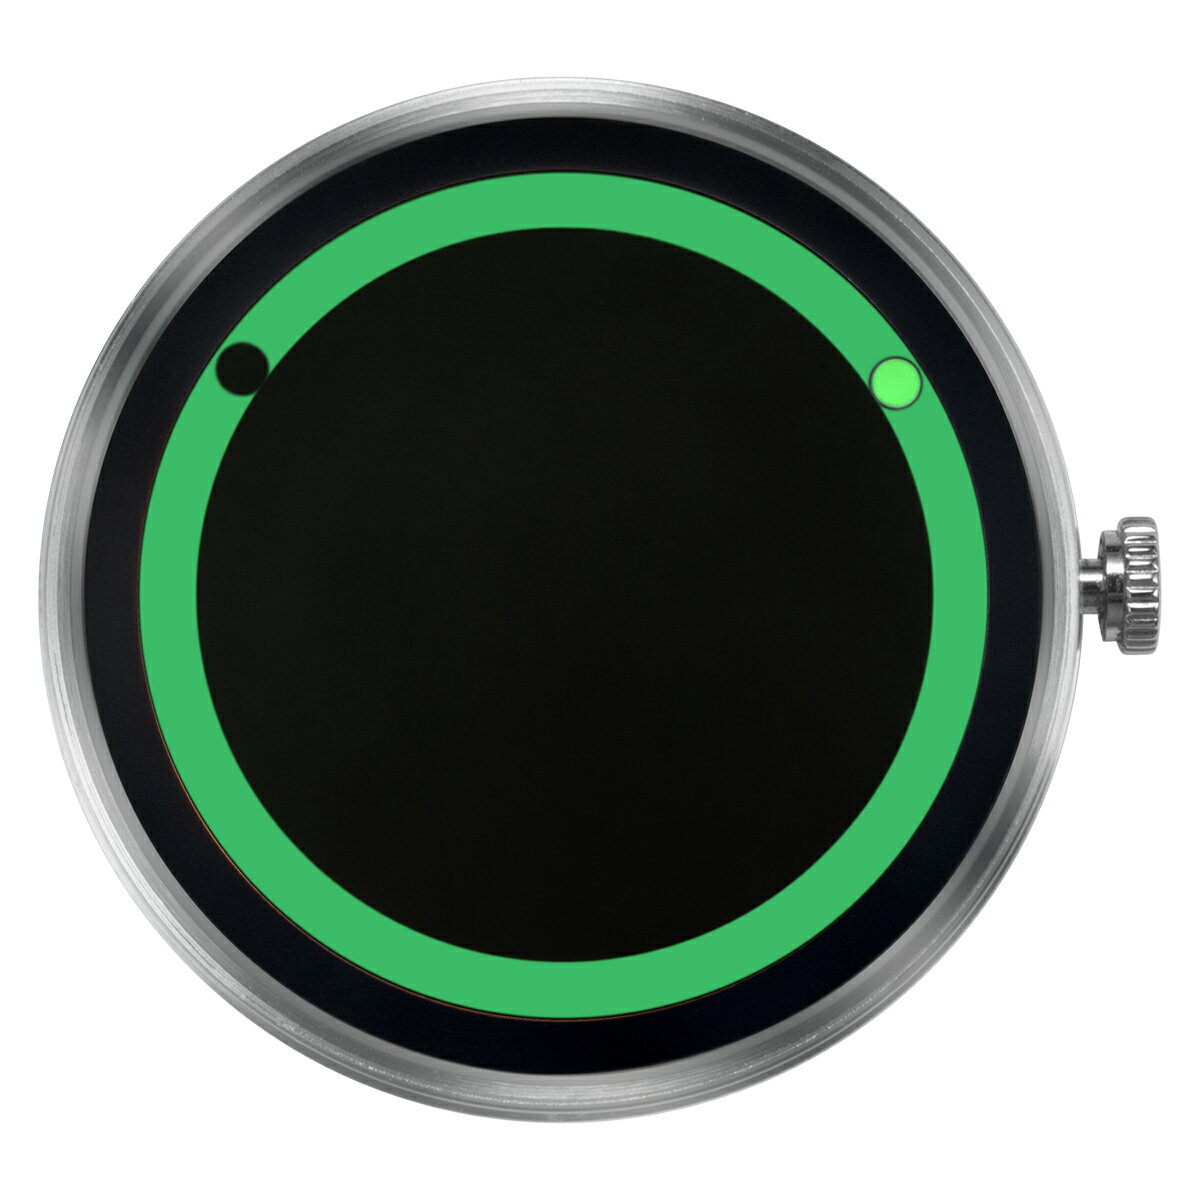 ZEROO 交換用クロックボディ ZEROO PLANET ECLIPSE ゼロ 電池式クォーツ 腕時計 [M13028]